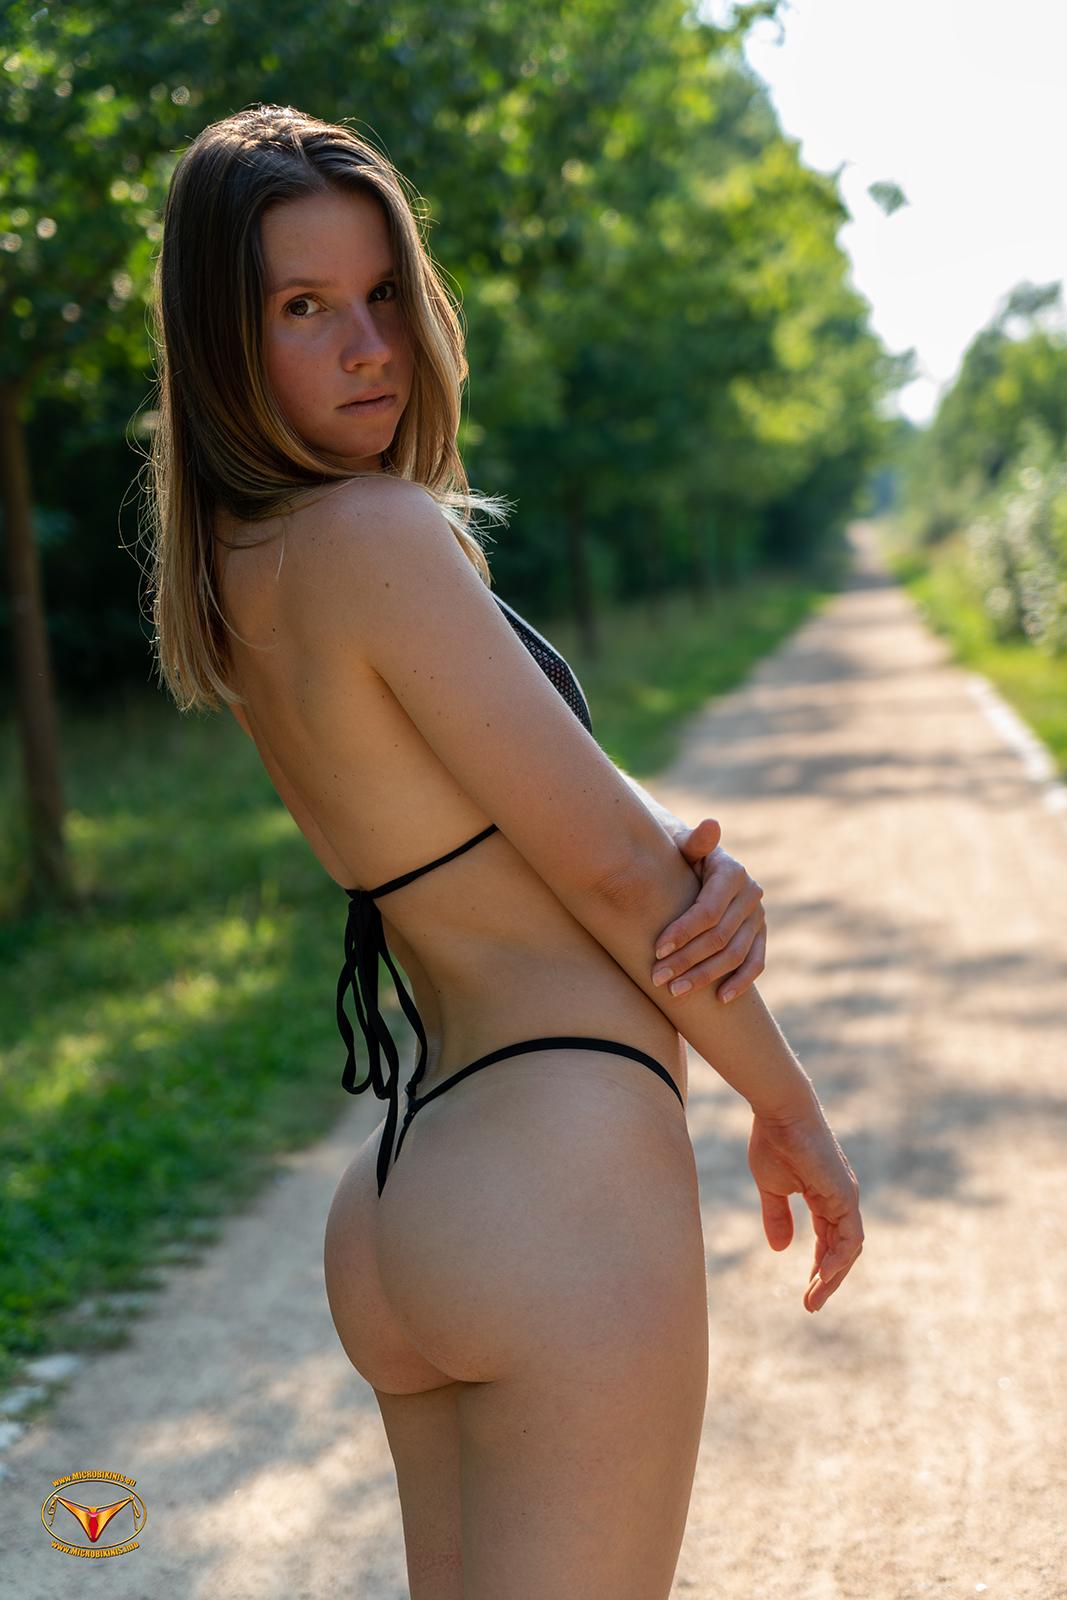 Bikinigirl, Micro Bikini Model Dominika Dodo Bikinigirl from Prague